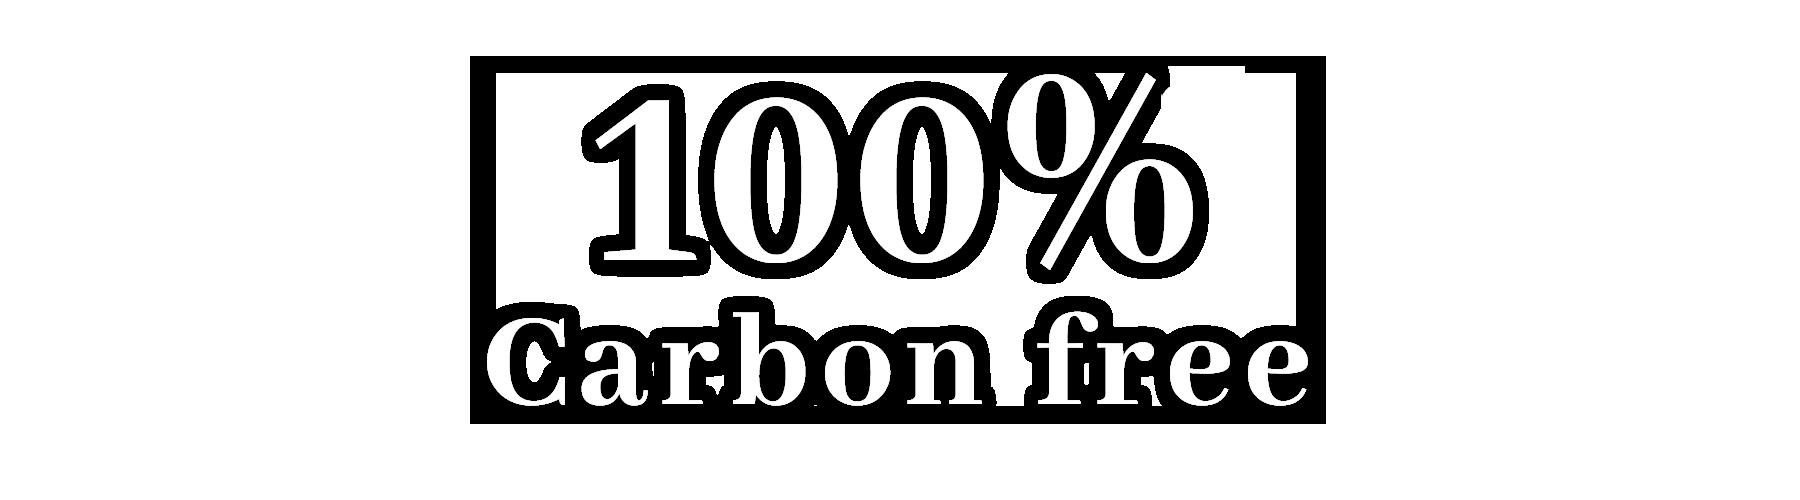 100% Carbon free